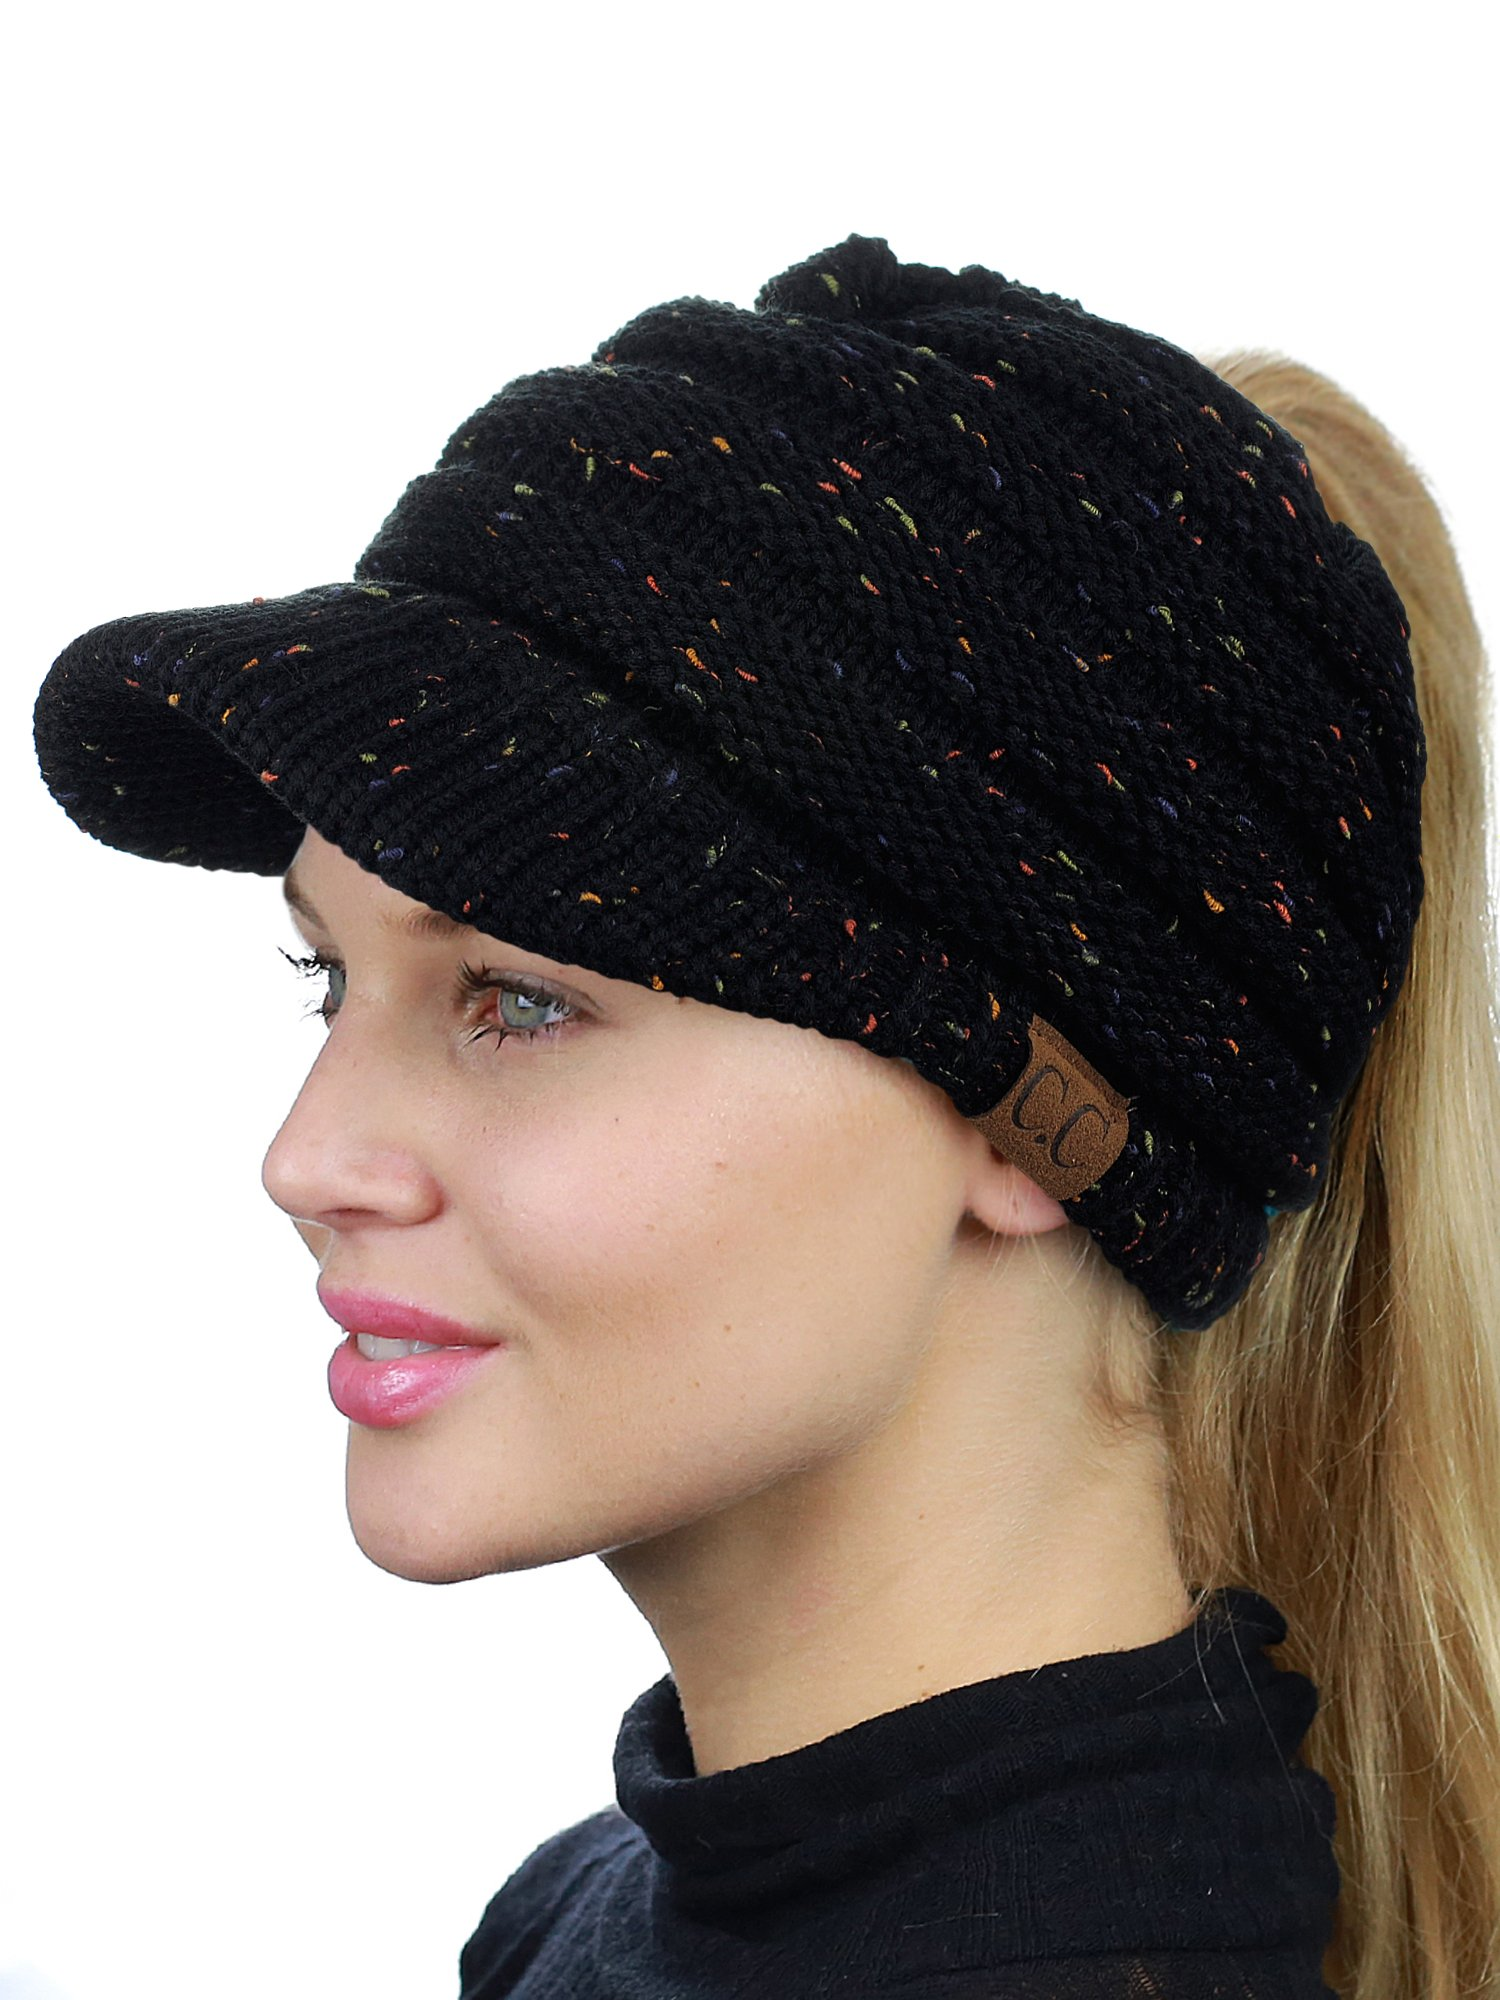 C.C BeanieTail Warm Knit Messy High Bun Ponytail Visor Beanie Cap, Confetti Black